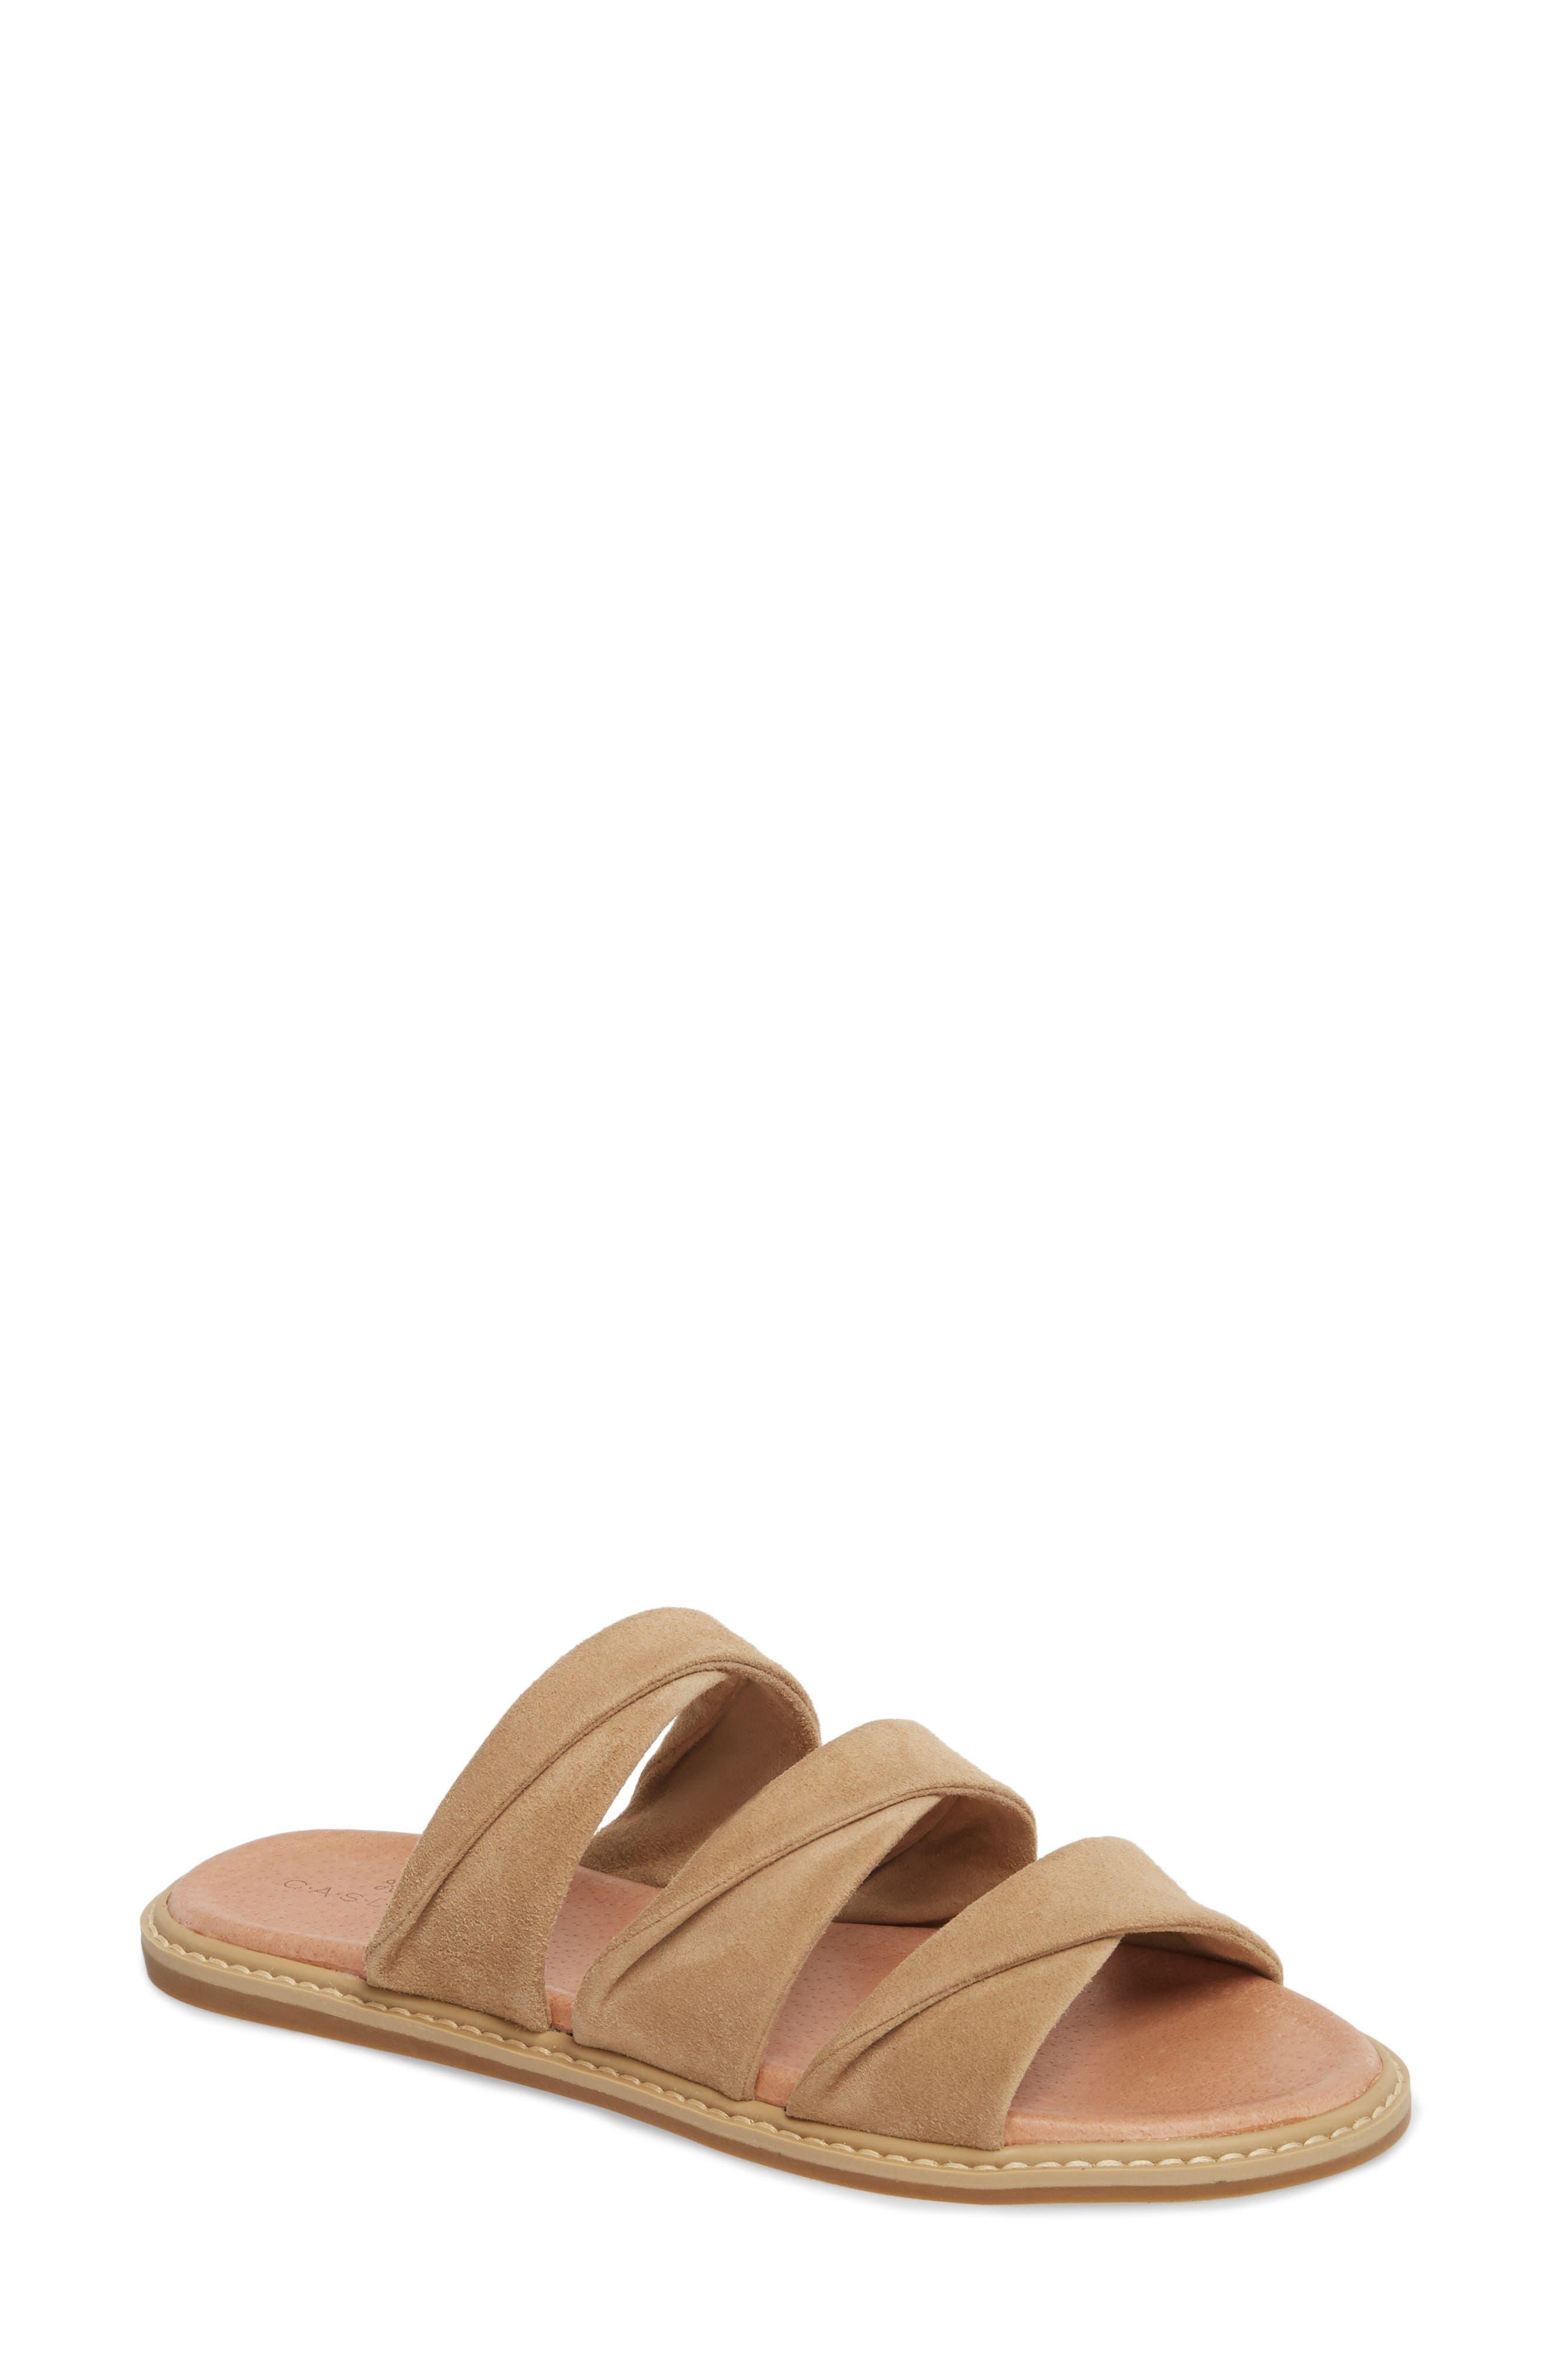 Cooper Slide Sandal,                             Main thumbnail 1, color,                             270